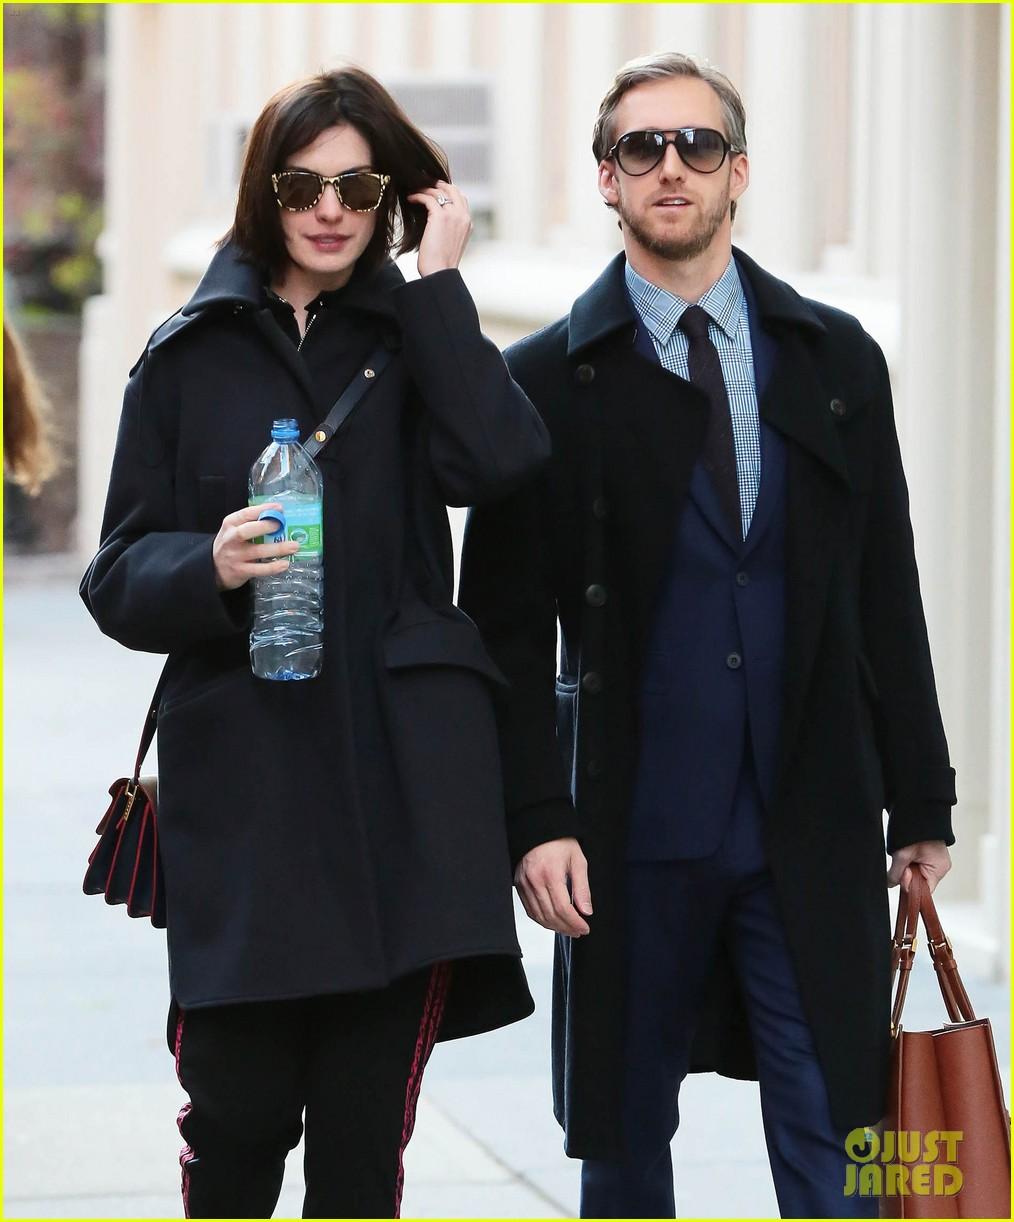 Anne Hathaway And Adam Shulman Shared A Kiss In Manhattan: Anne Hathaway 'Likes The Idea' Of Hillary Clinton For